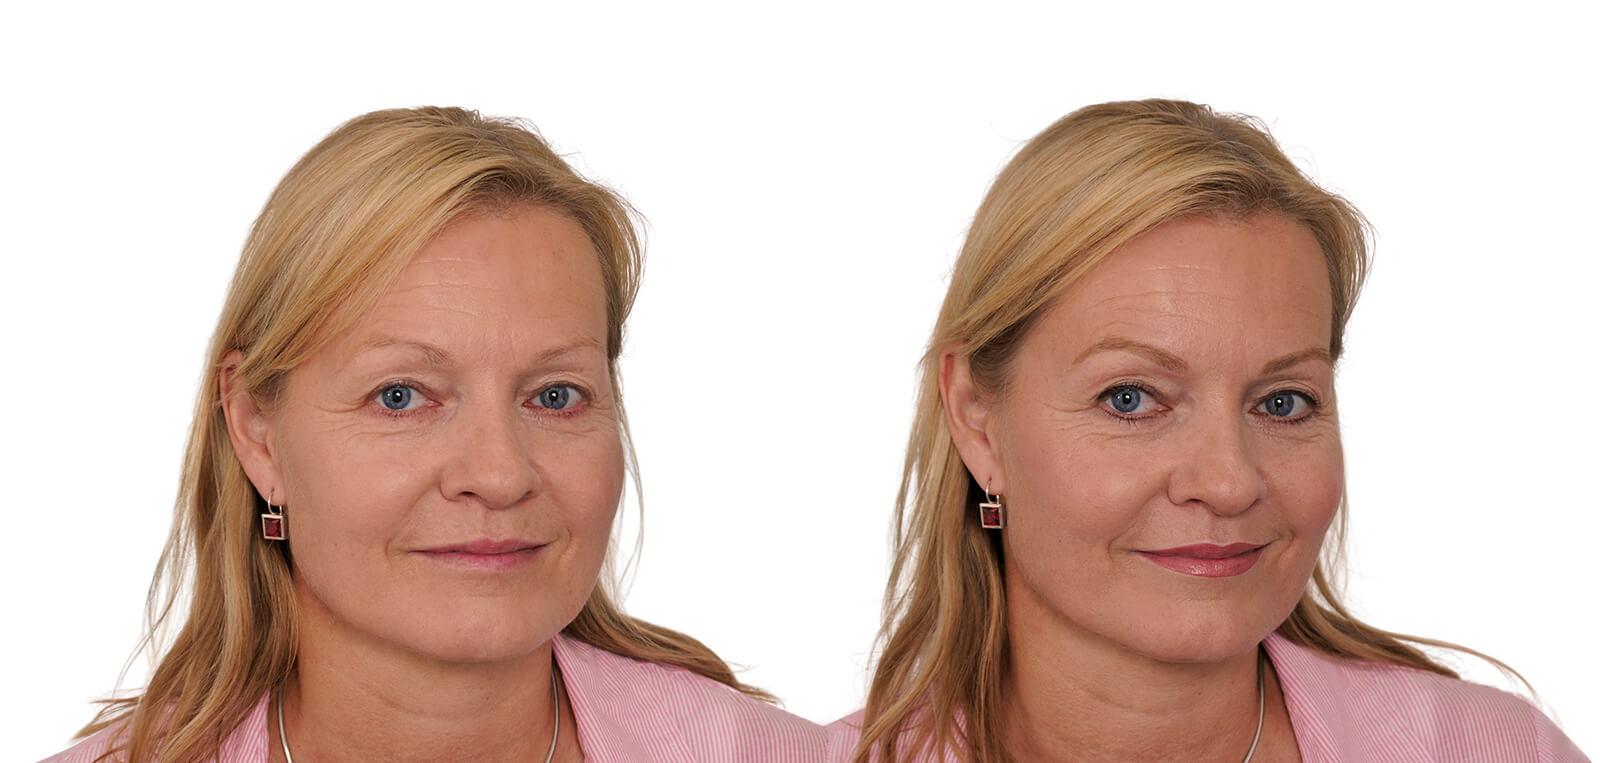 Permanent Make-Up vorher/nachher komplett Damen 05 | Der Jungbrunnen Aichach